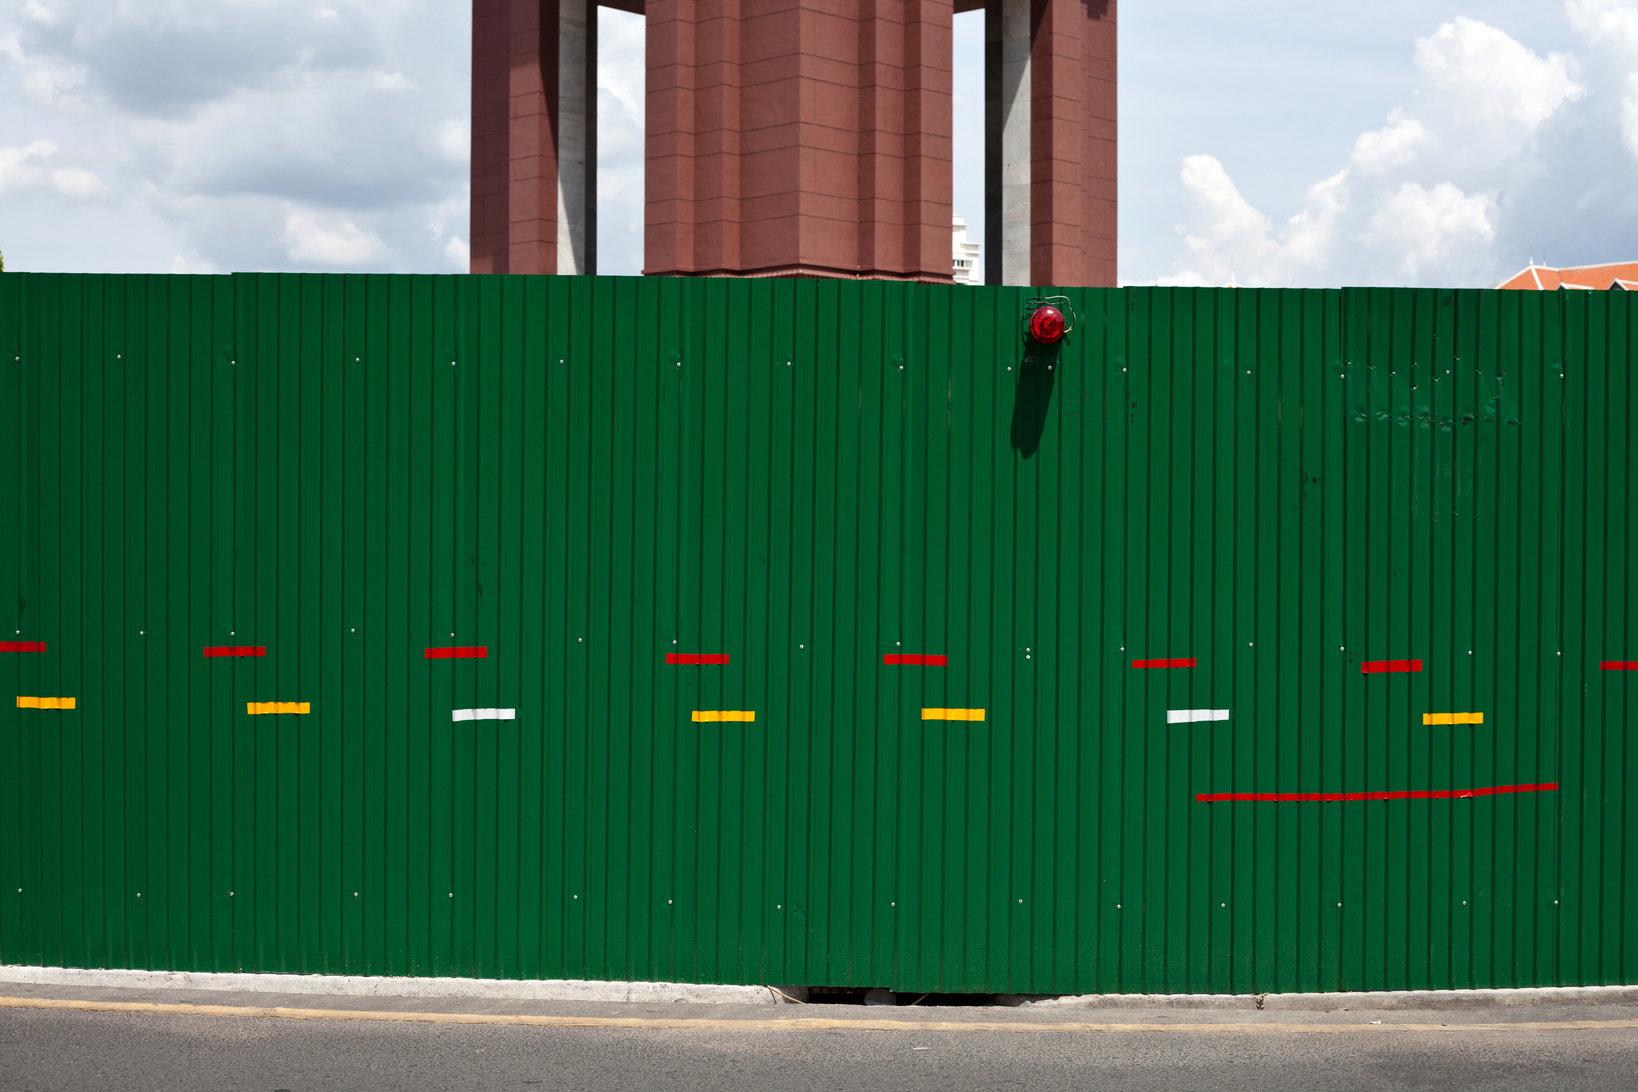 Phnom Penh. Cambodia. 2011: Independence Monument